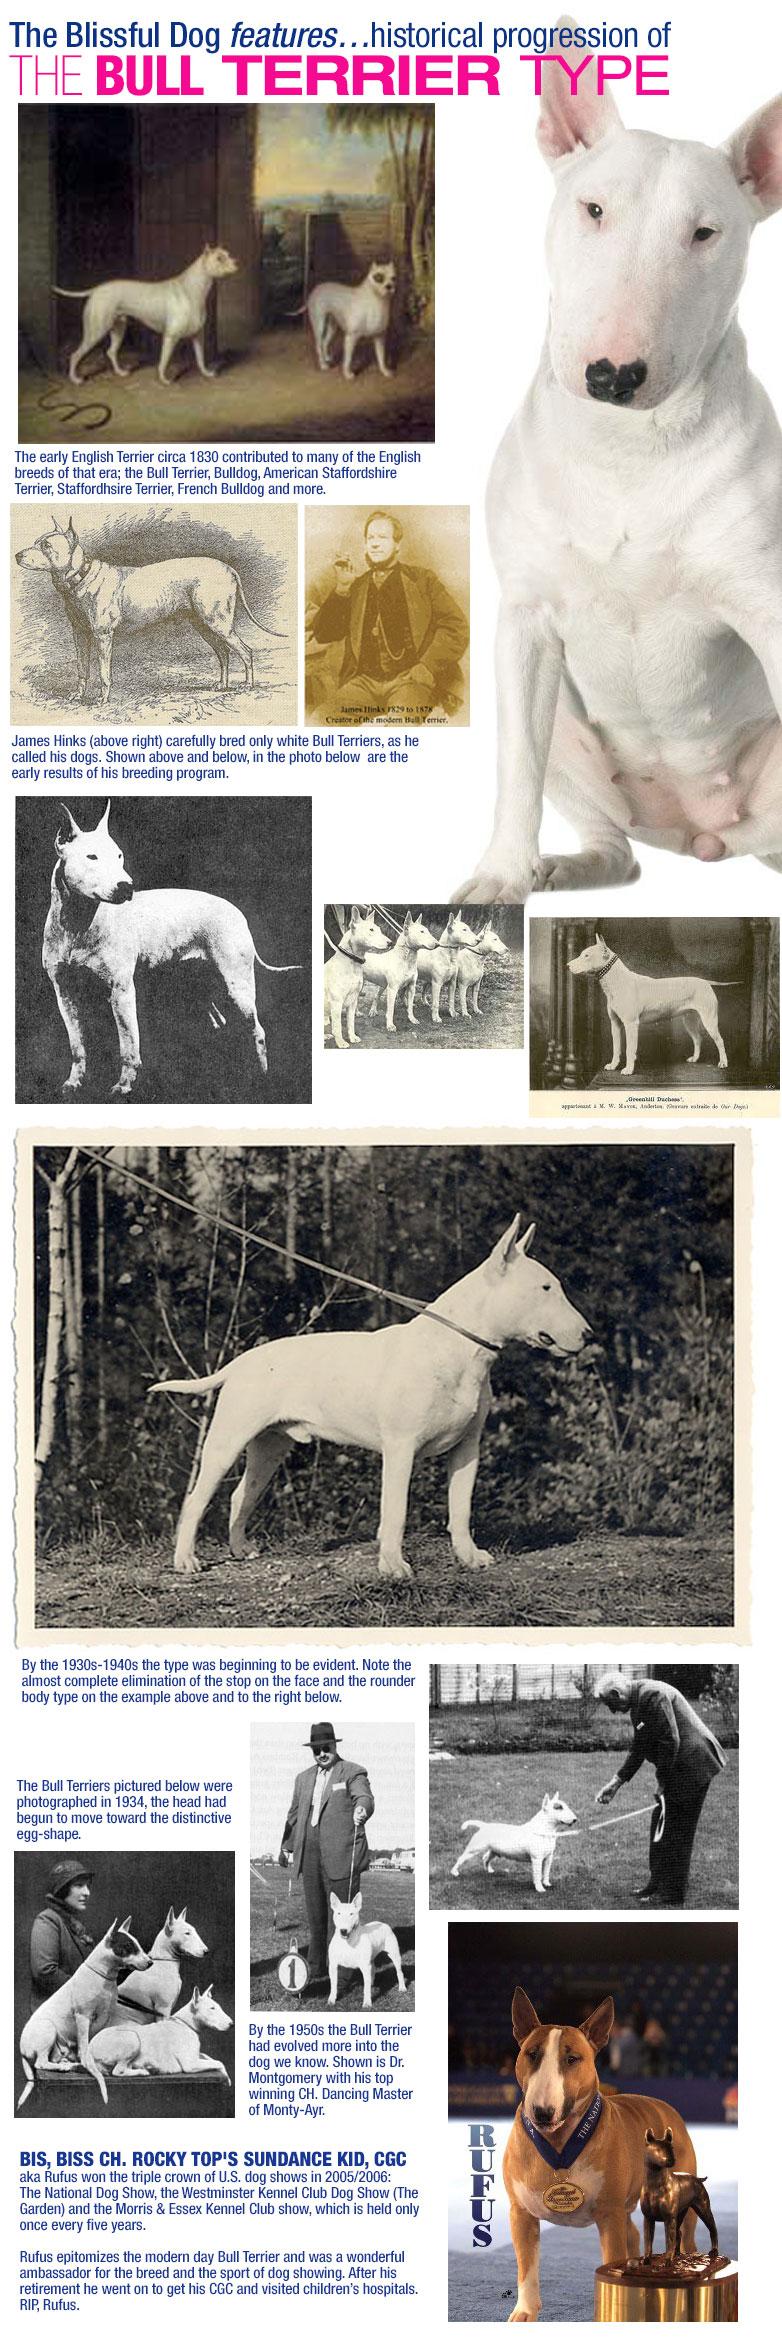 The Bull Terrier Has Evolved From A Leggy White Terrier Type To